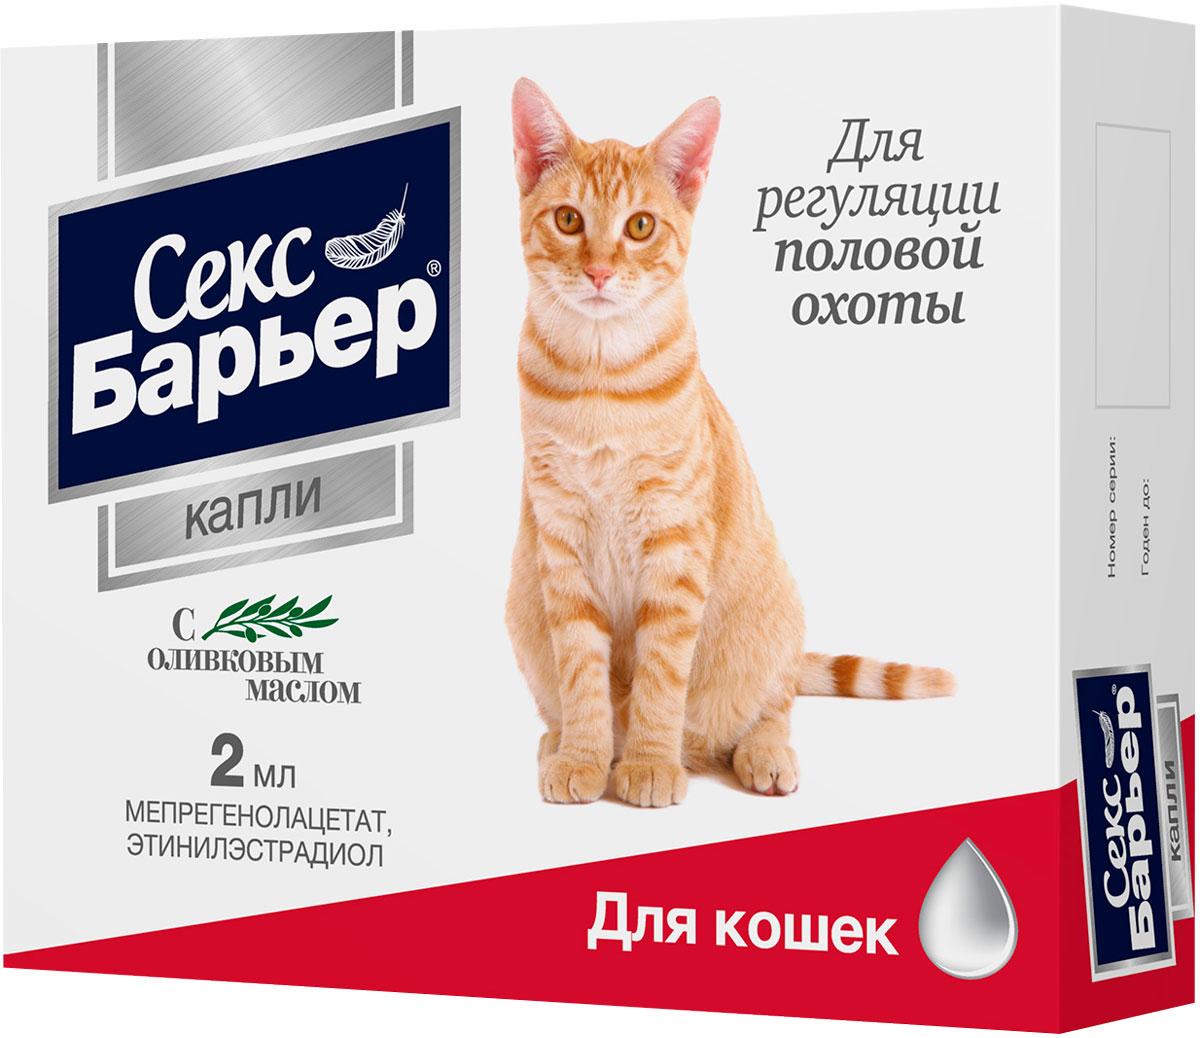 секс барьер капли для кошек 2 мл (1 шт)